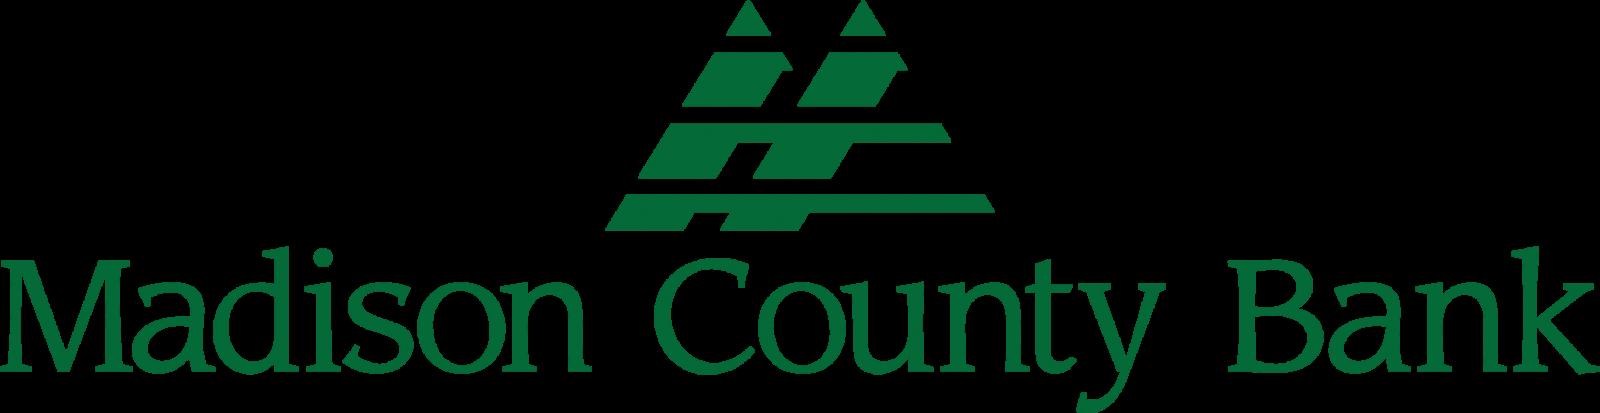 Madison County Bank logo